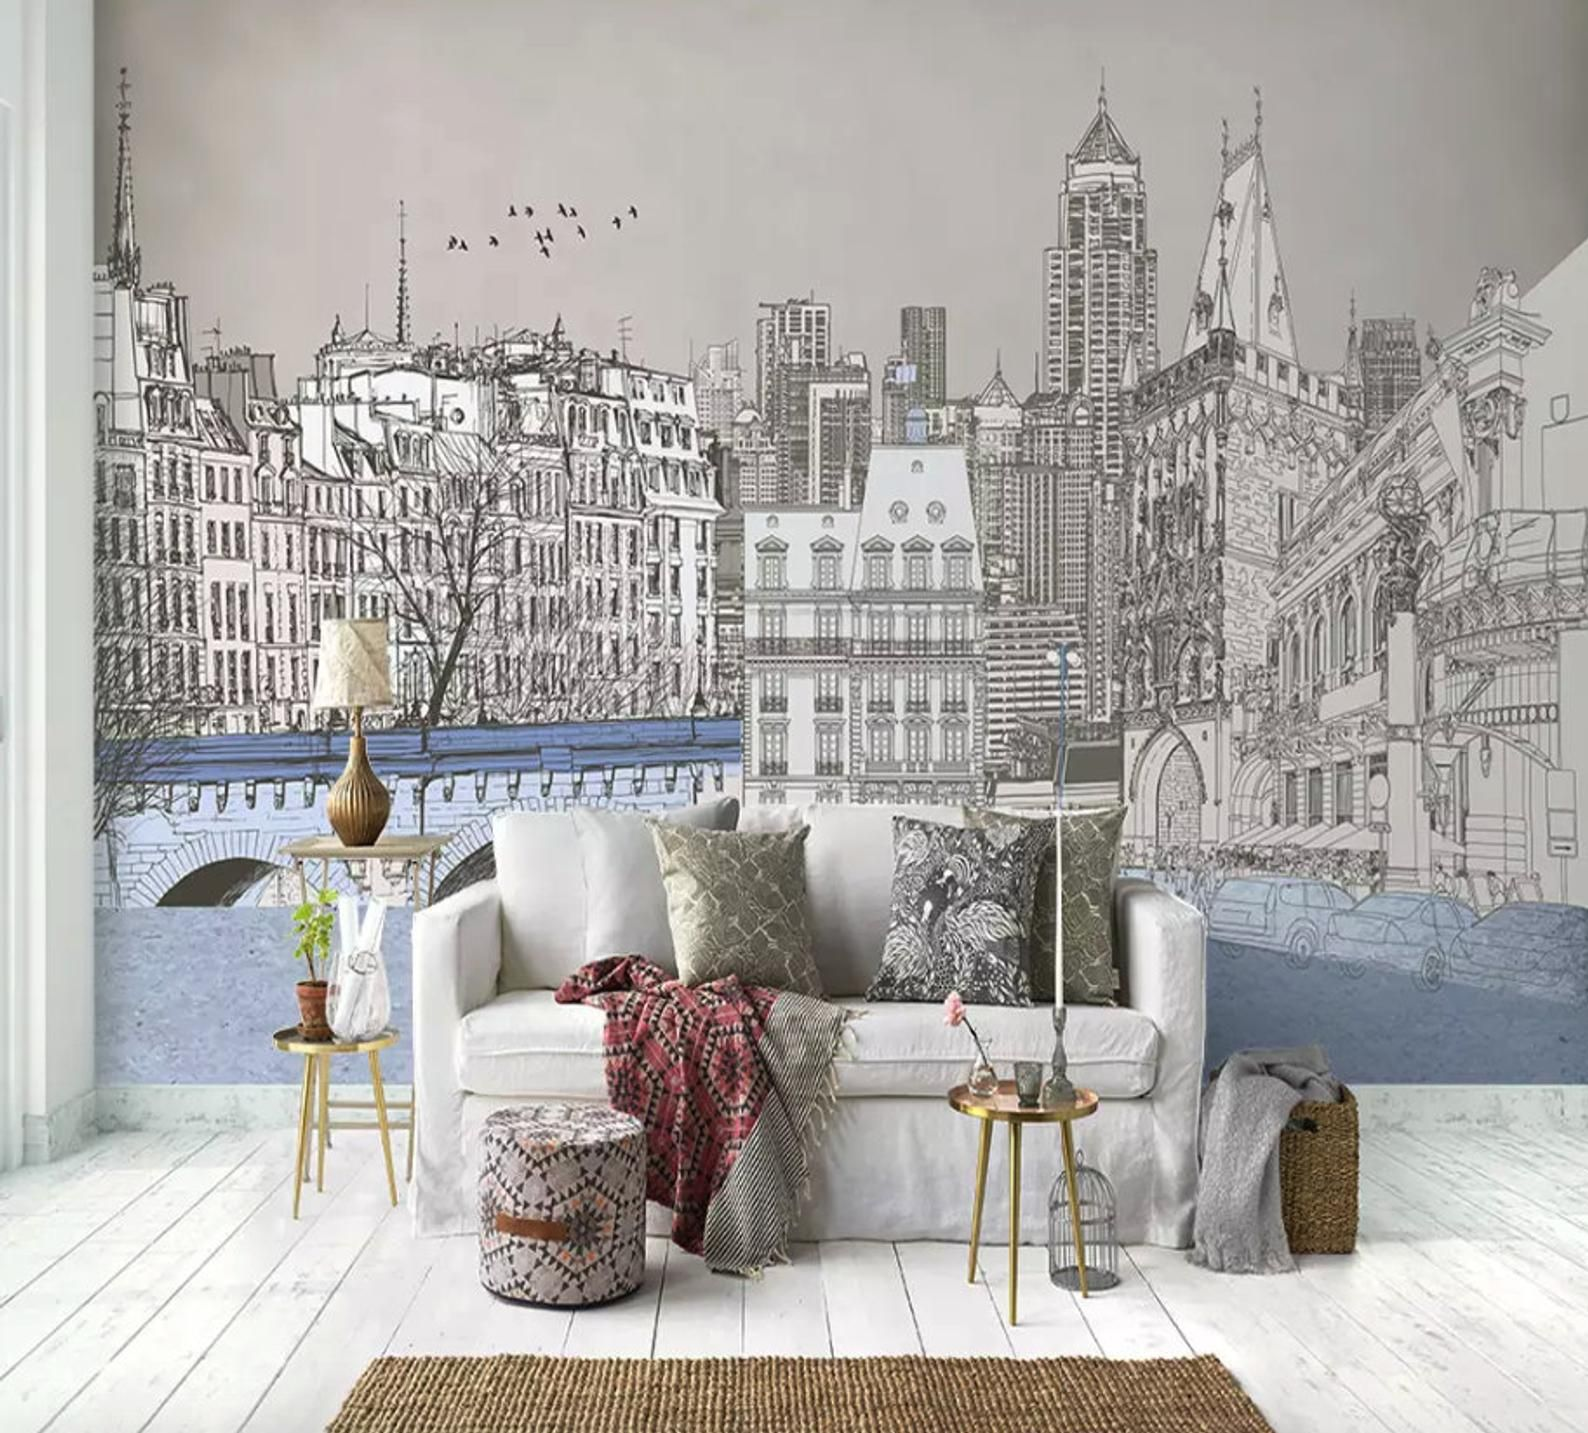 Charcoal City Wallpaper London Cityscape Wall Mural City Etsy